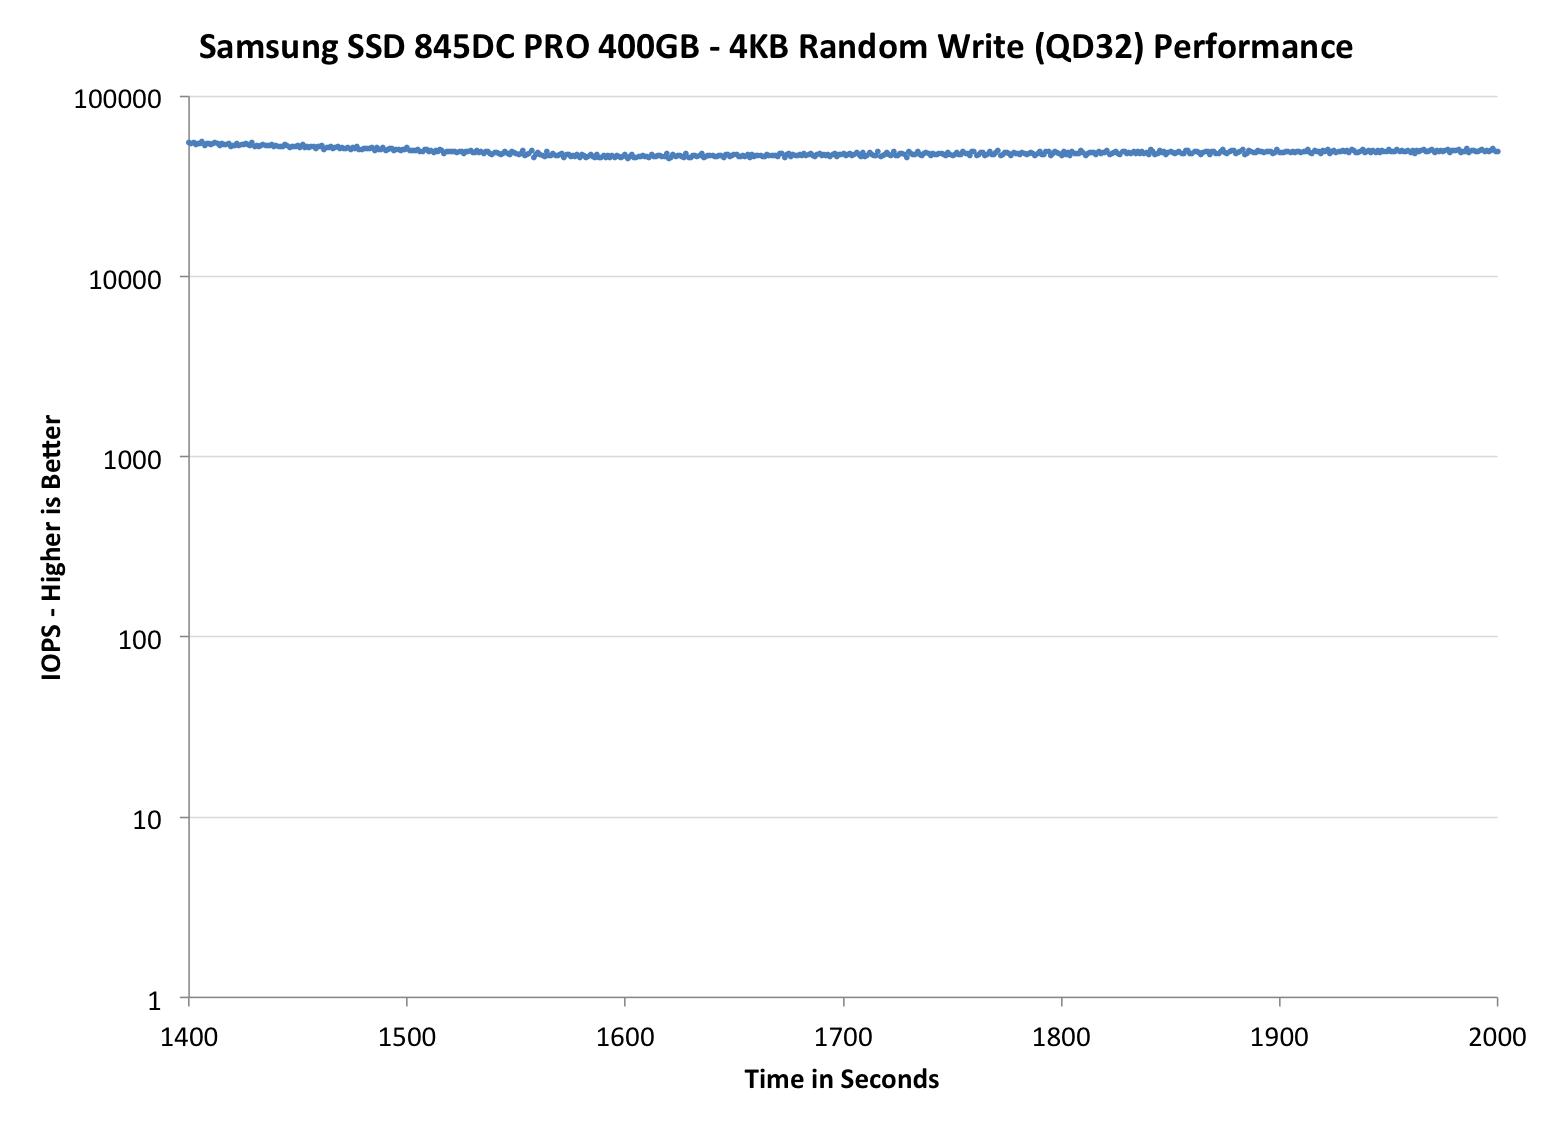 Samsung 845DC PRO 400GB